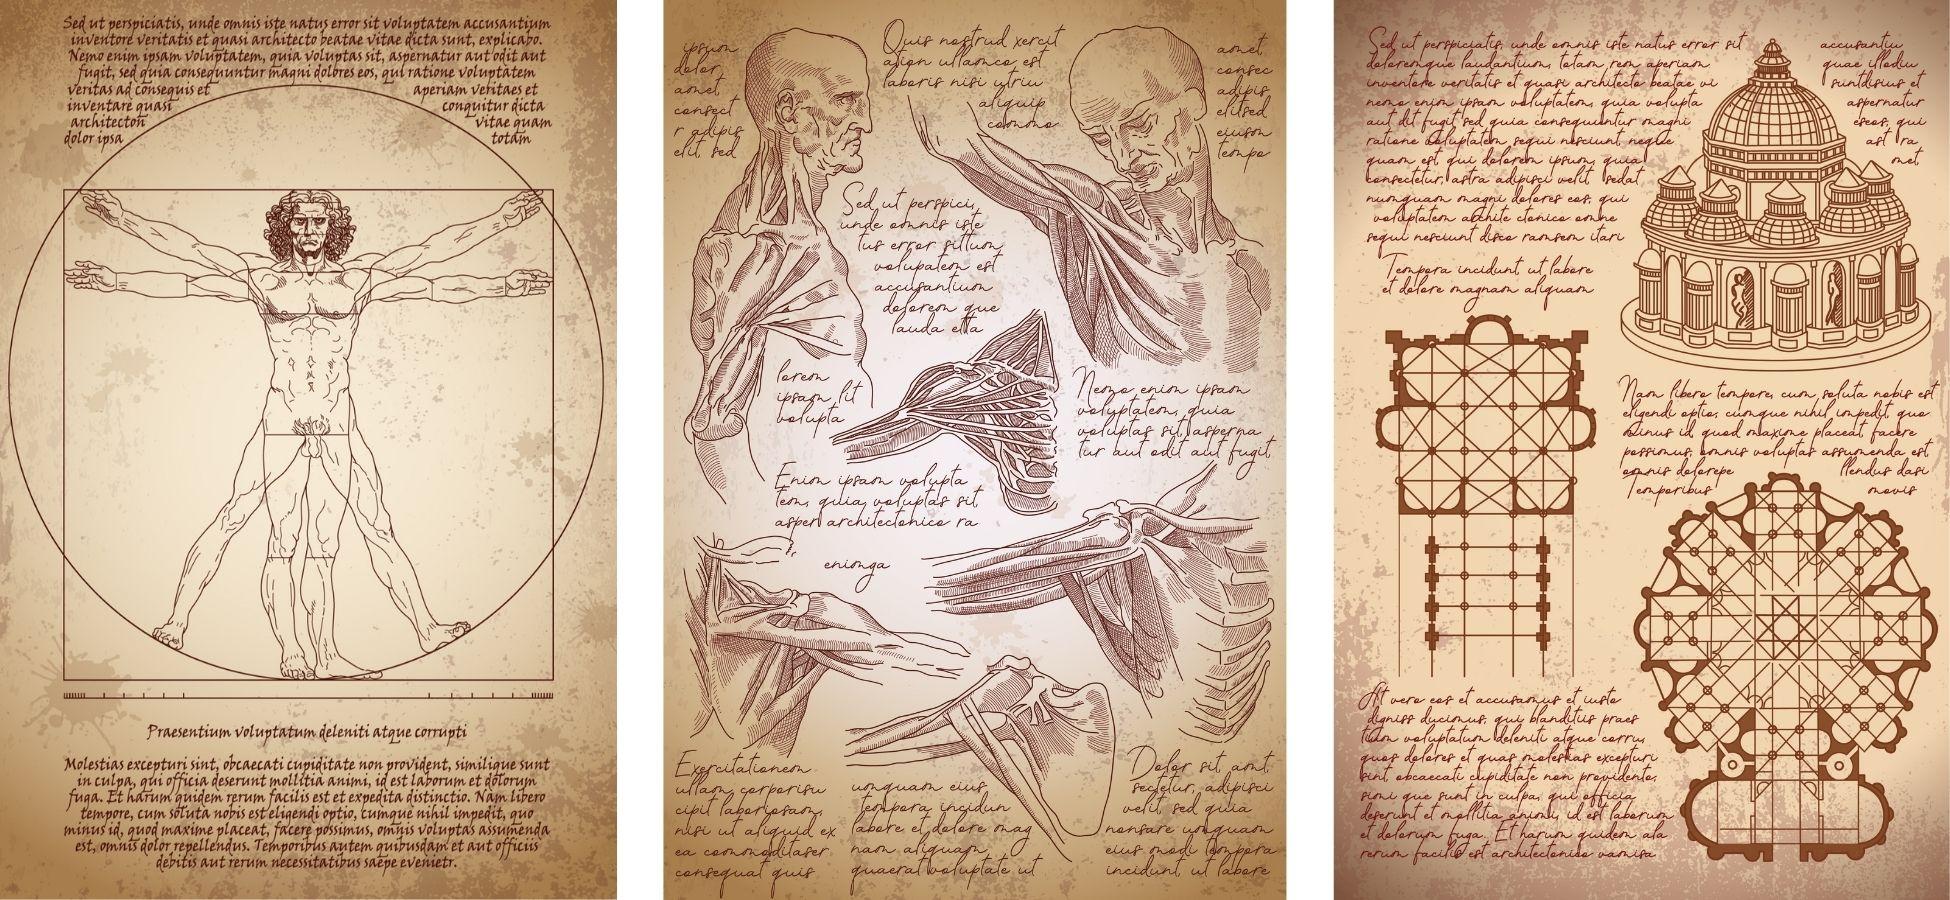 Croquis de Vinci